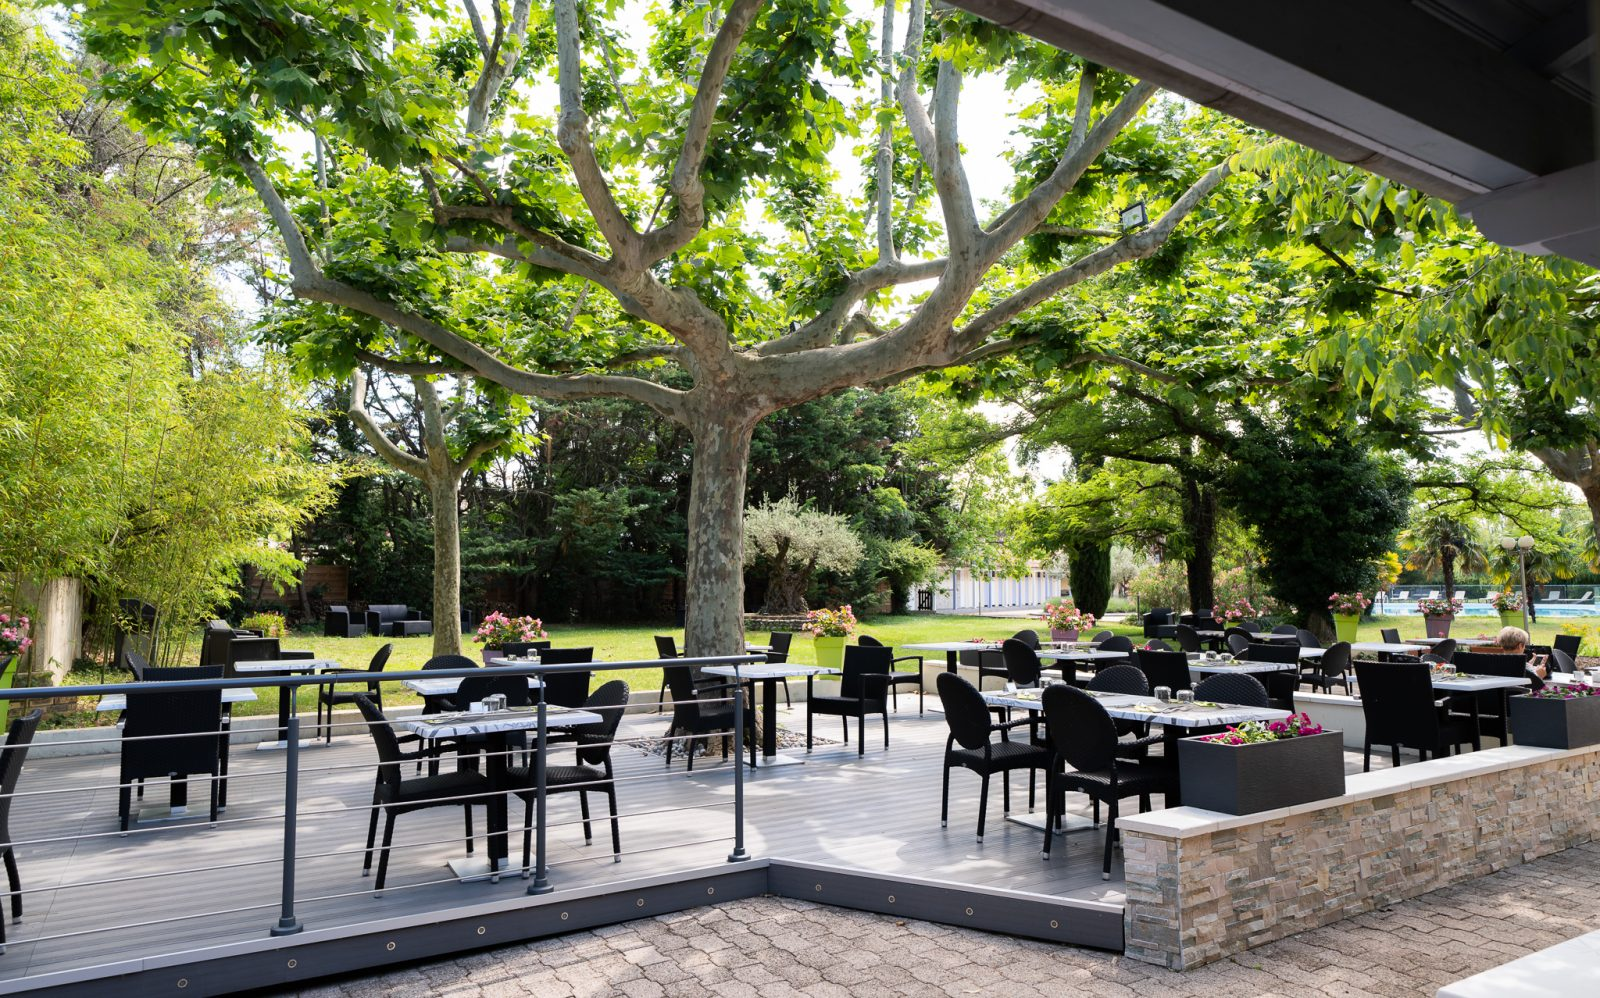 Hôtel-restaurant-spa les Oliviers